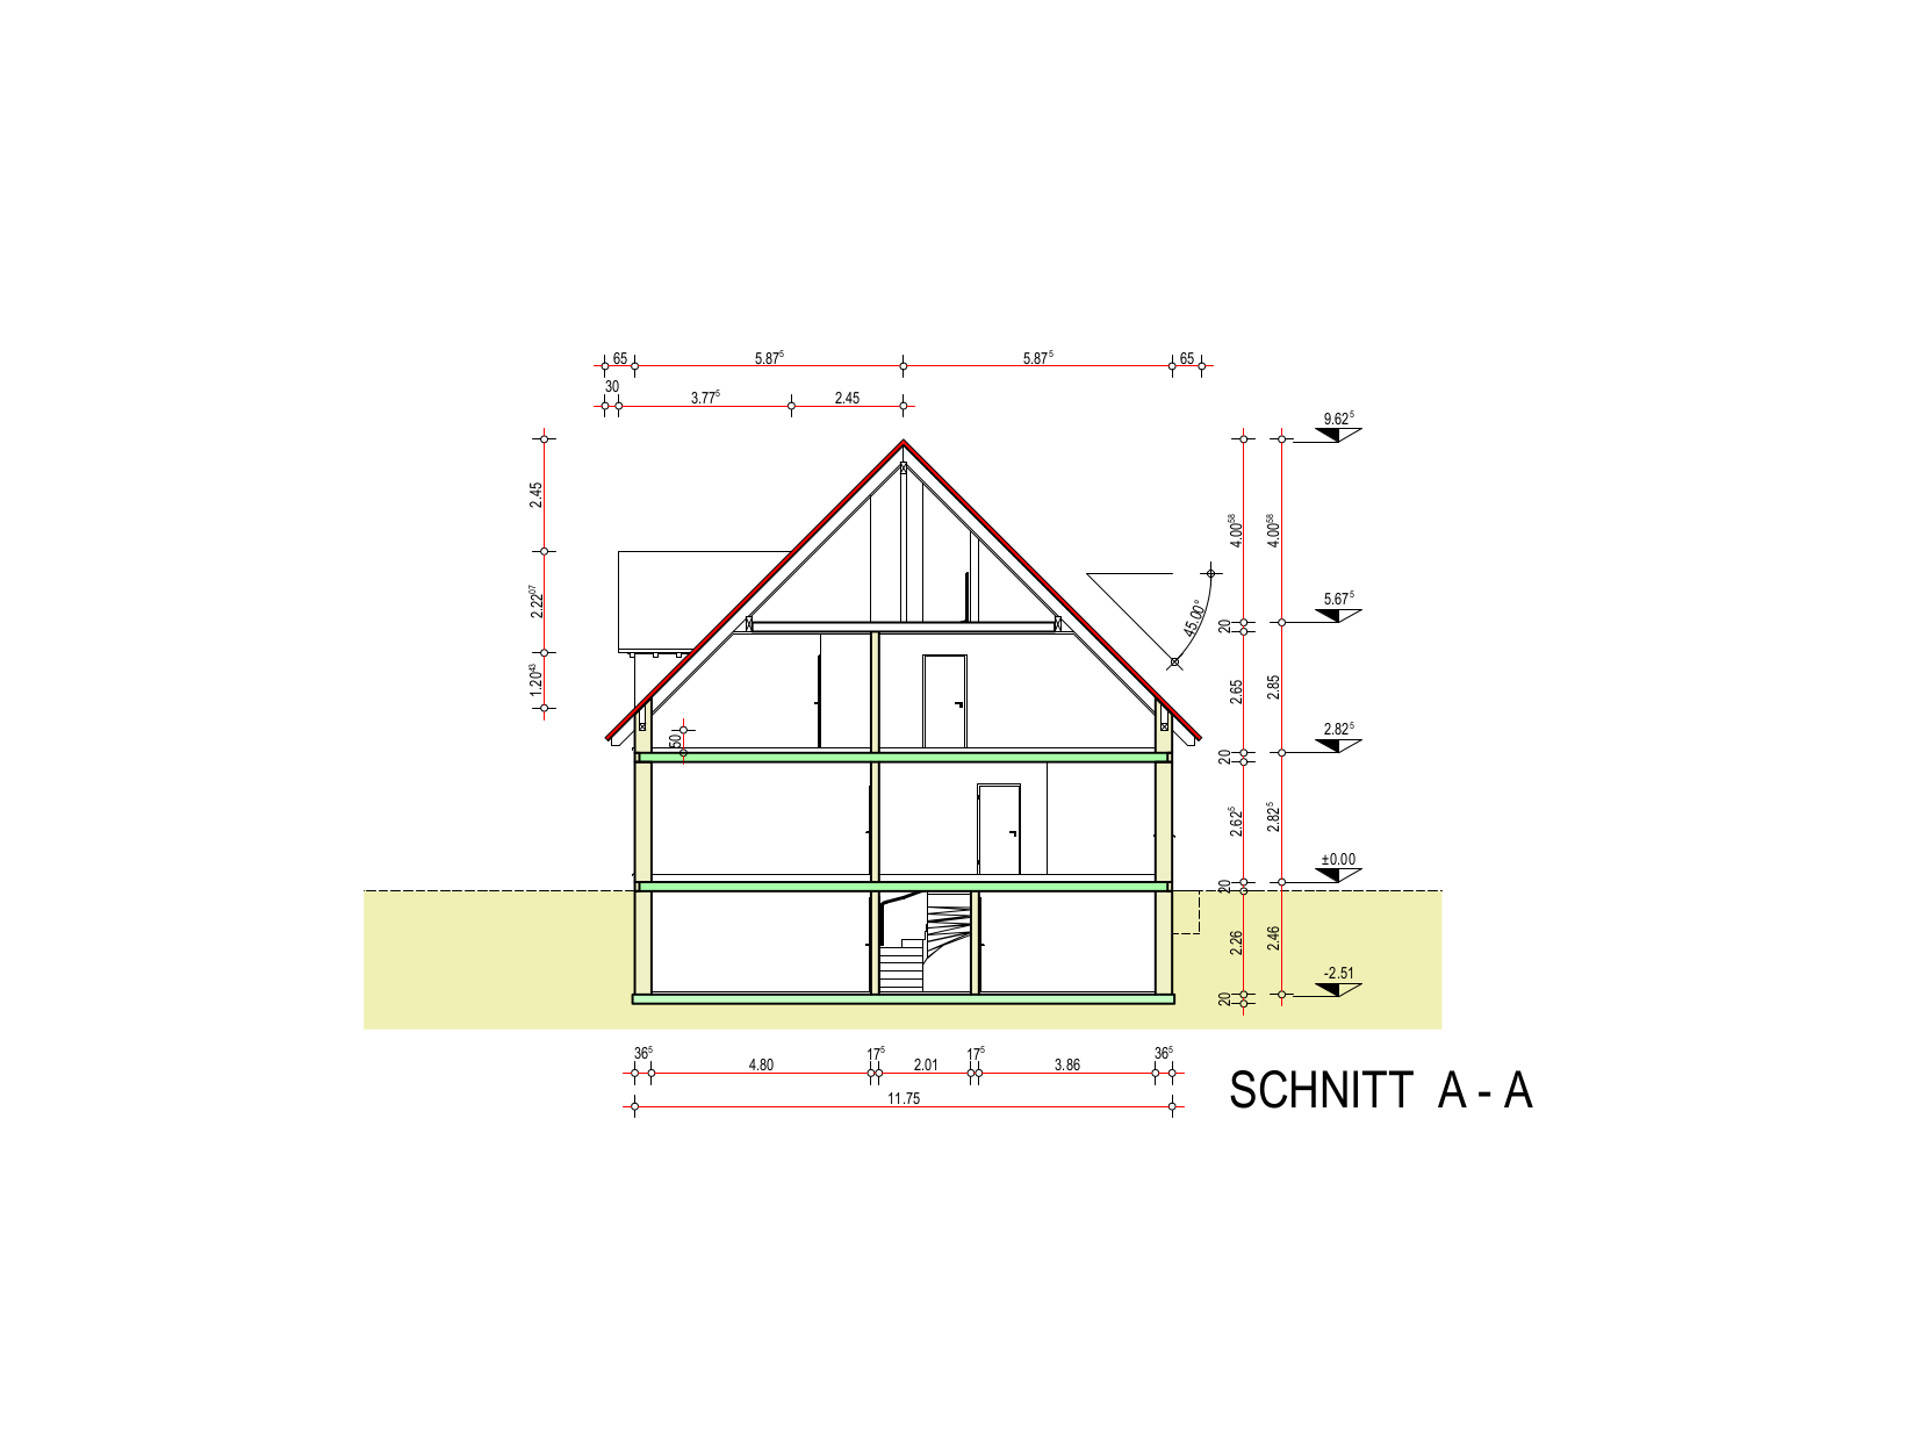 Schnitt Haustyp Freiburg